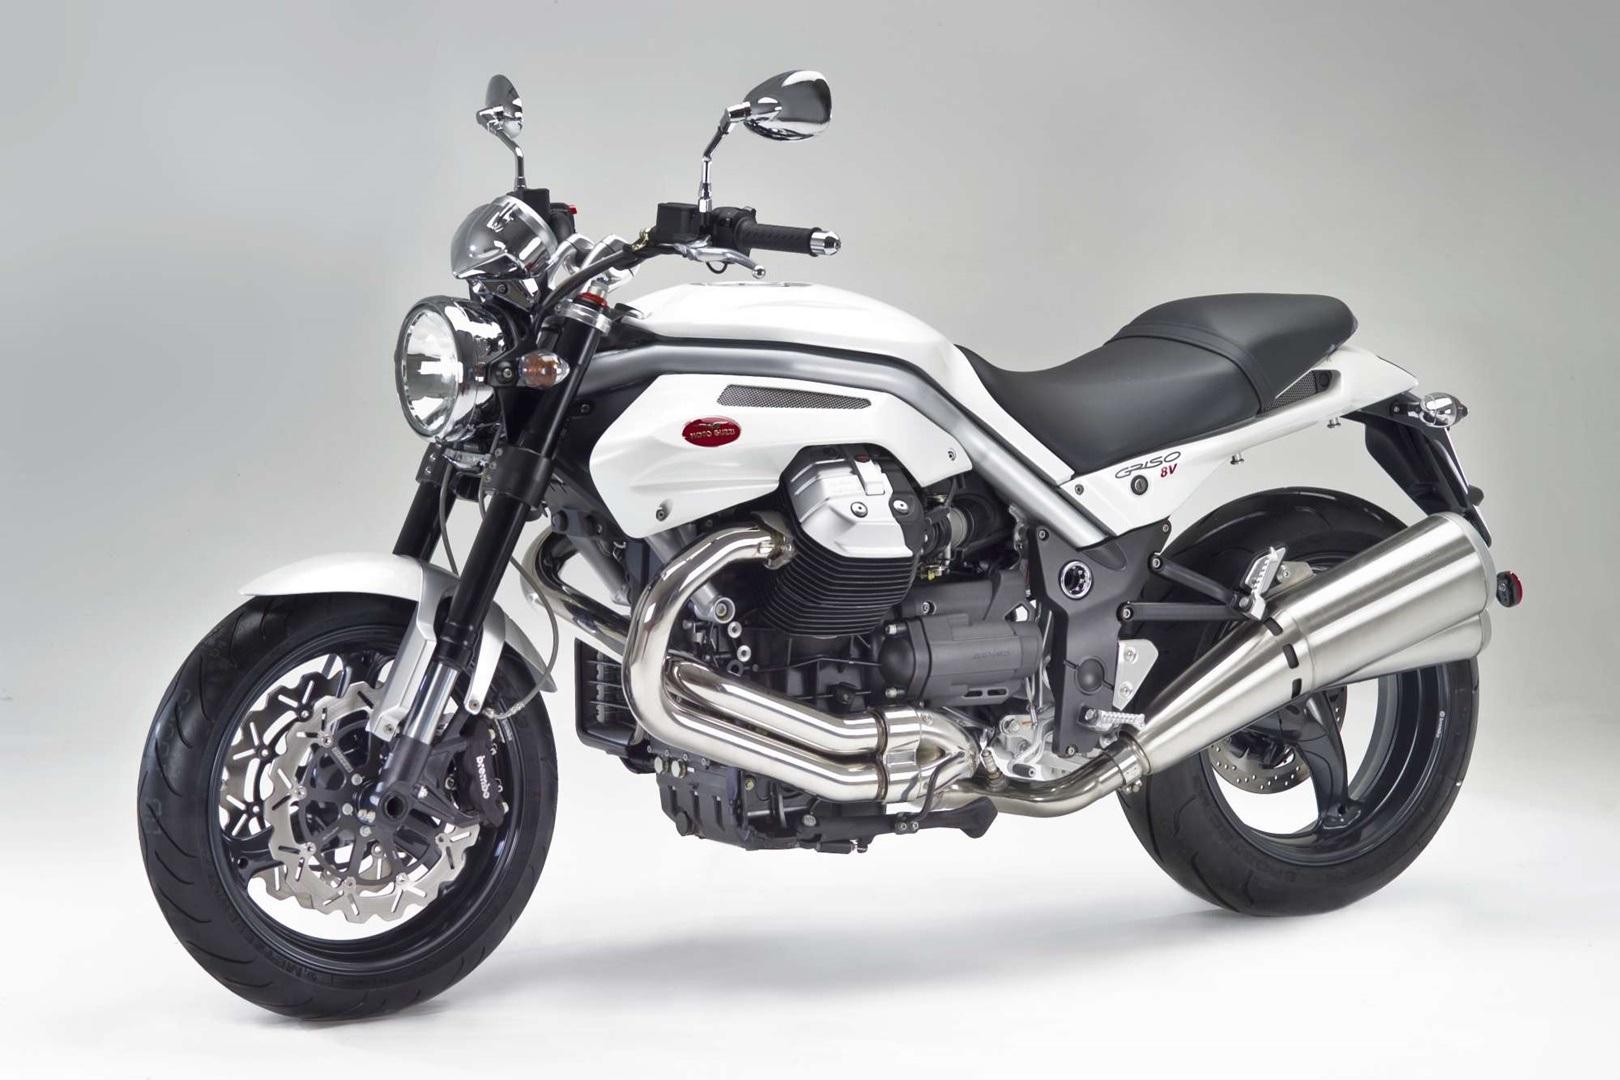 Moto del día: Moto Guzzi Griso 1200 8V